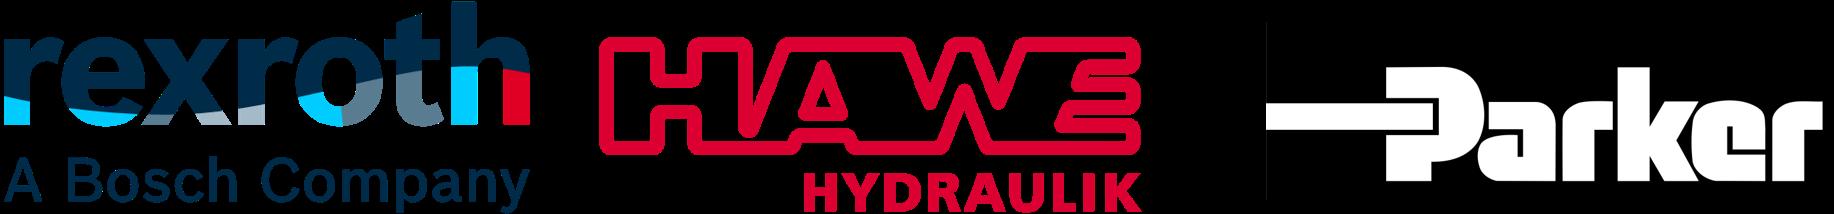 Brands Hydraulikmotoren bei Lippold im Angebot